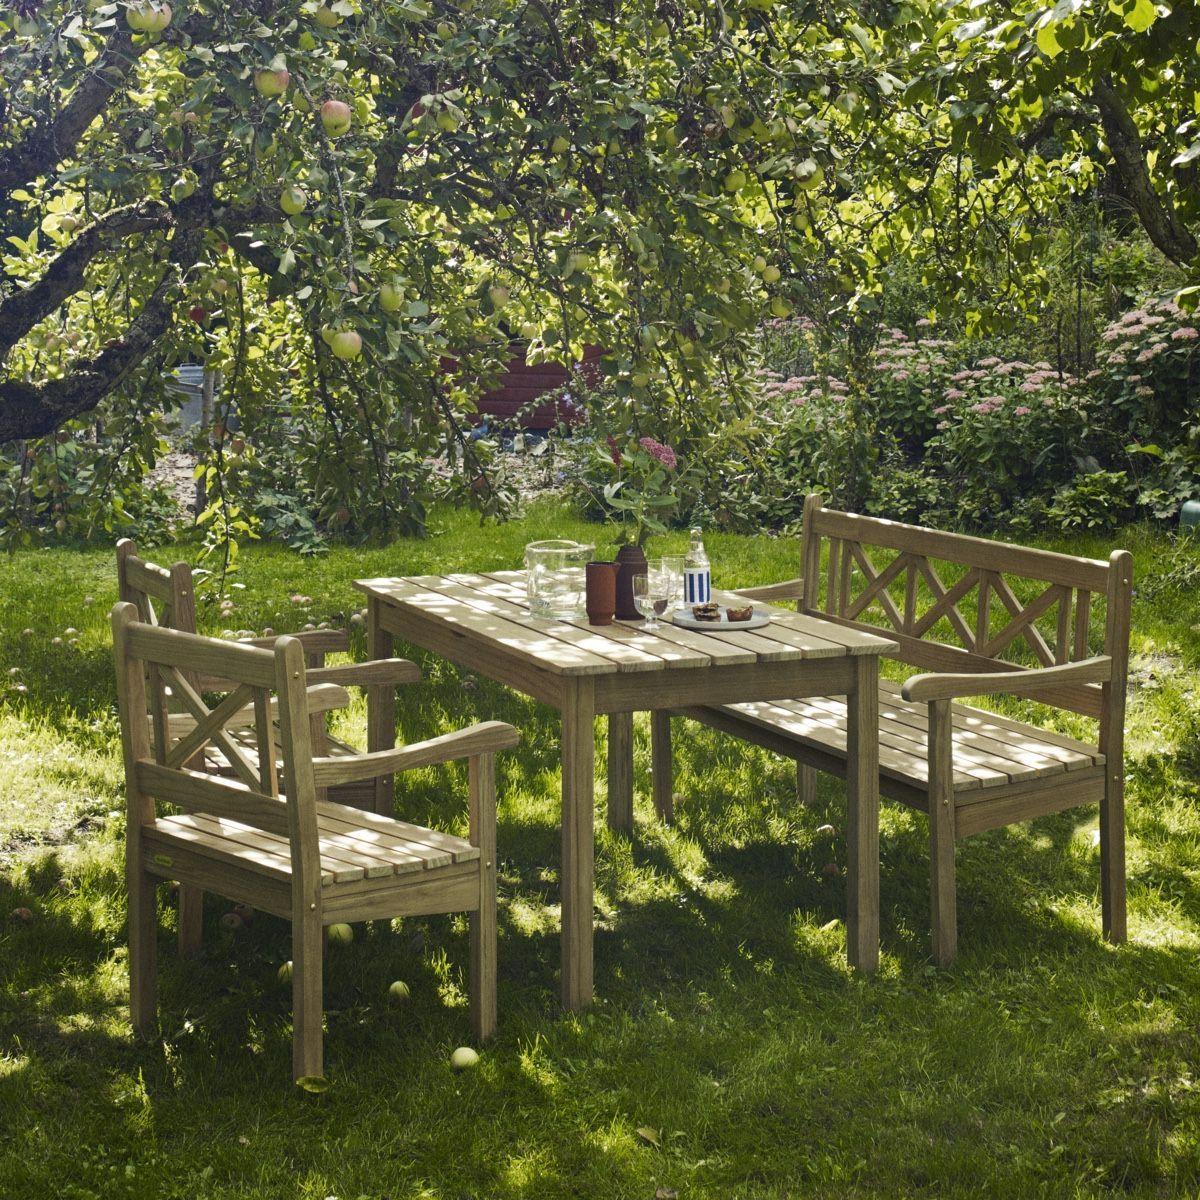 Skagerak Skagen outdoor dining set on in the garden